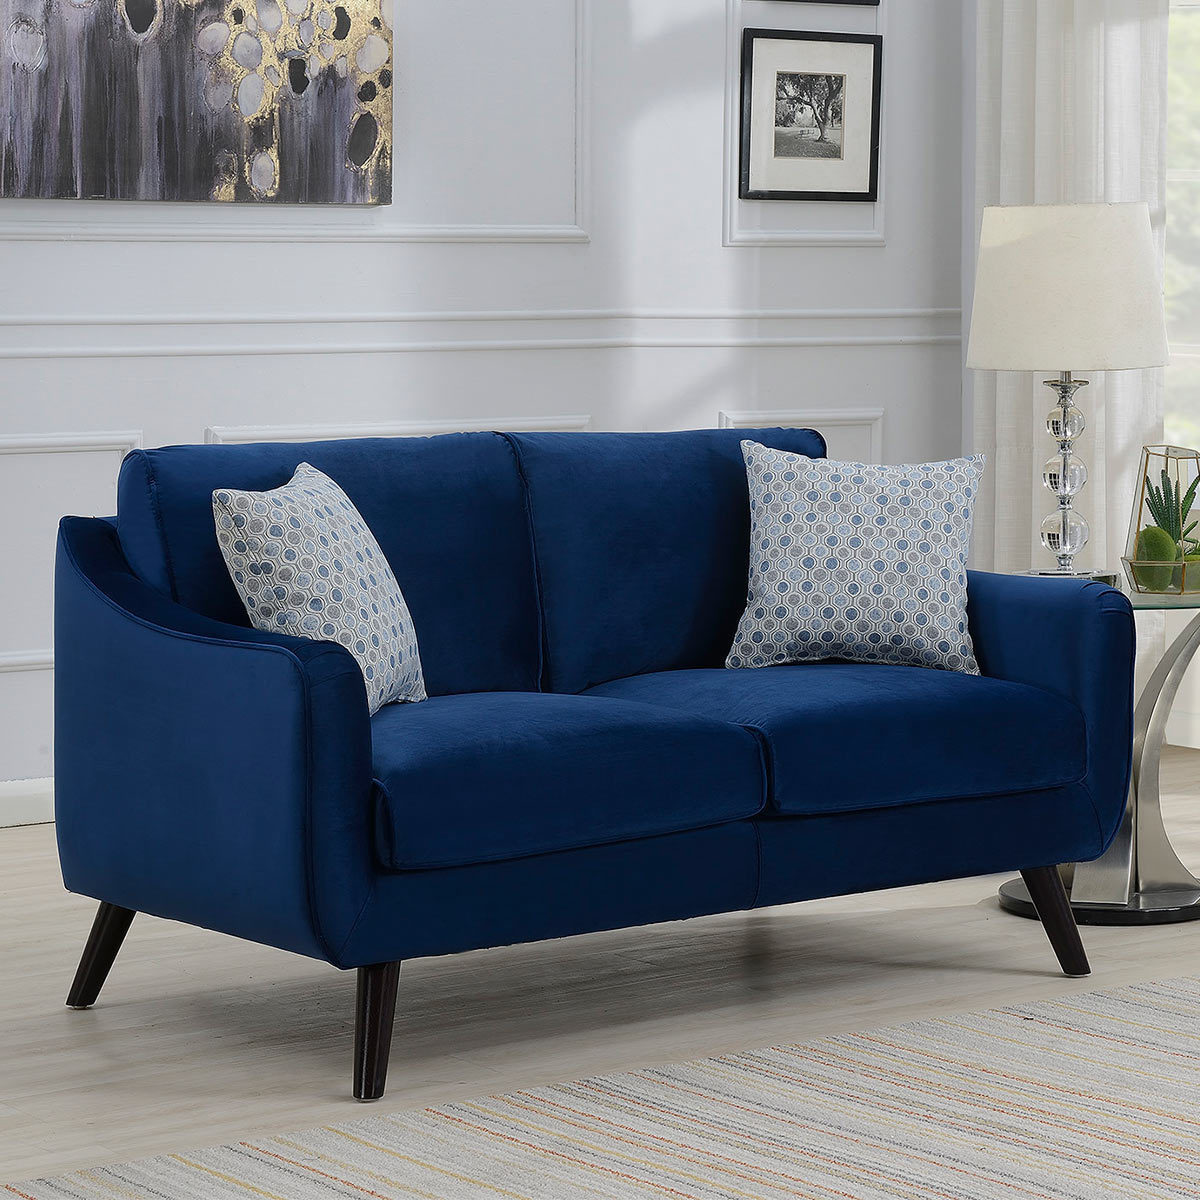 Bainbridge Blue Velvet 2 Seater Sofa Costco Uk